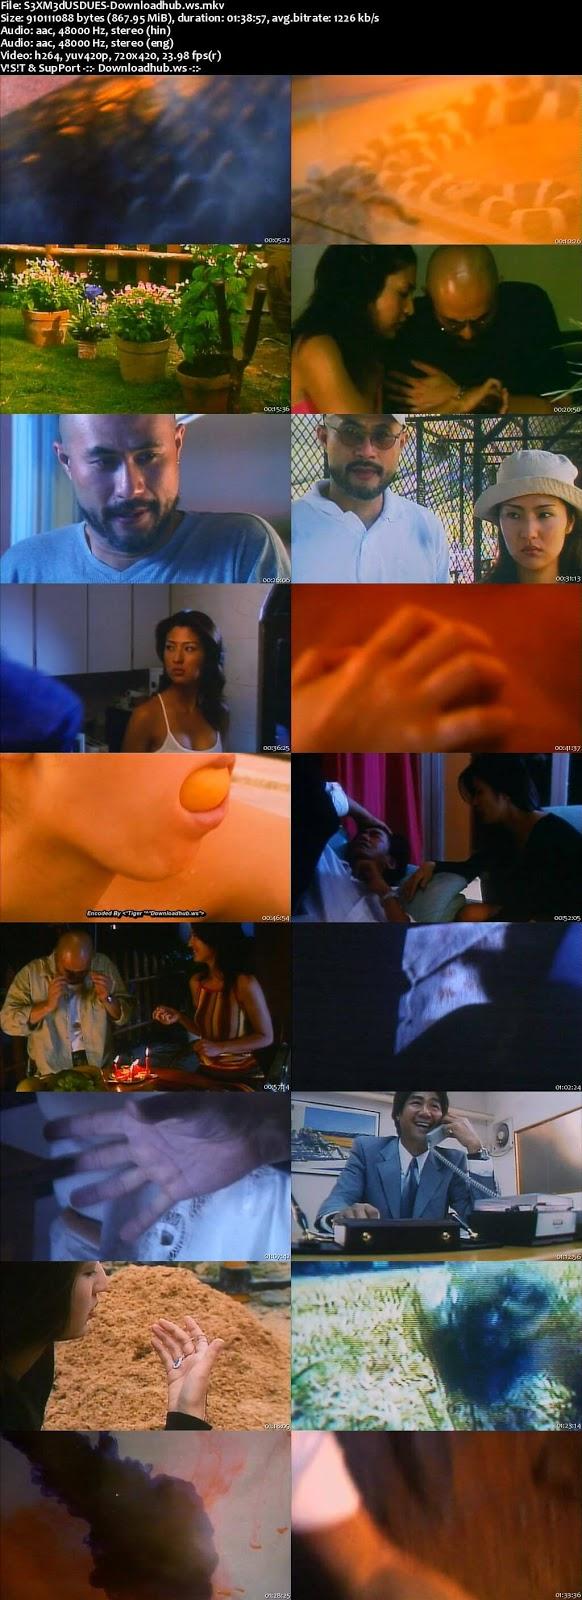 Sex Medusa 2001 Hindi Dual Audio 720p DVDRip Download